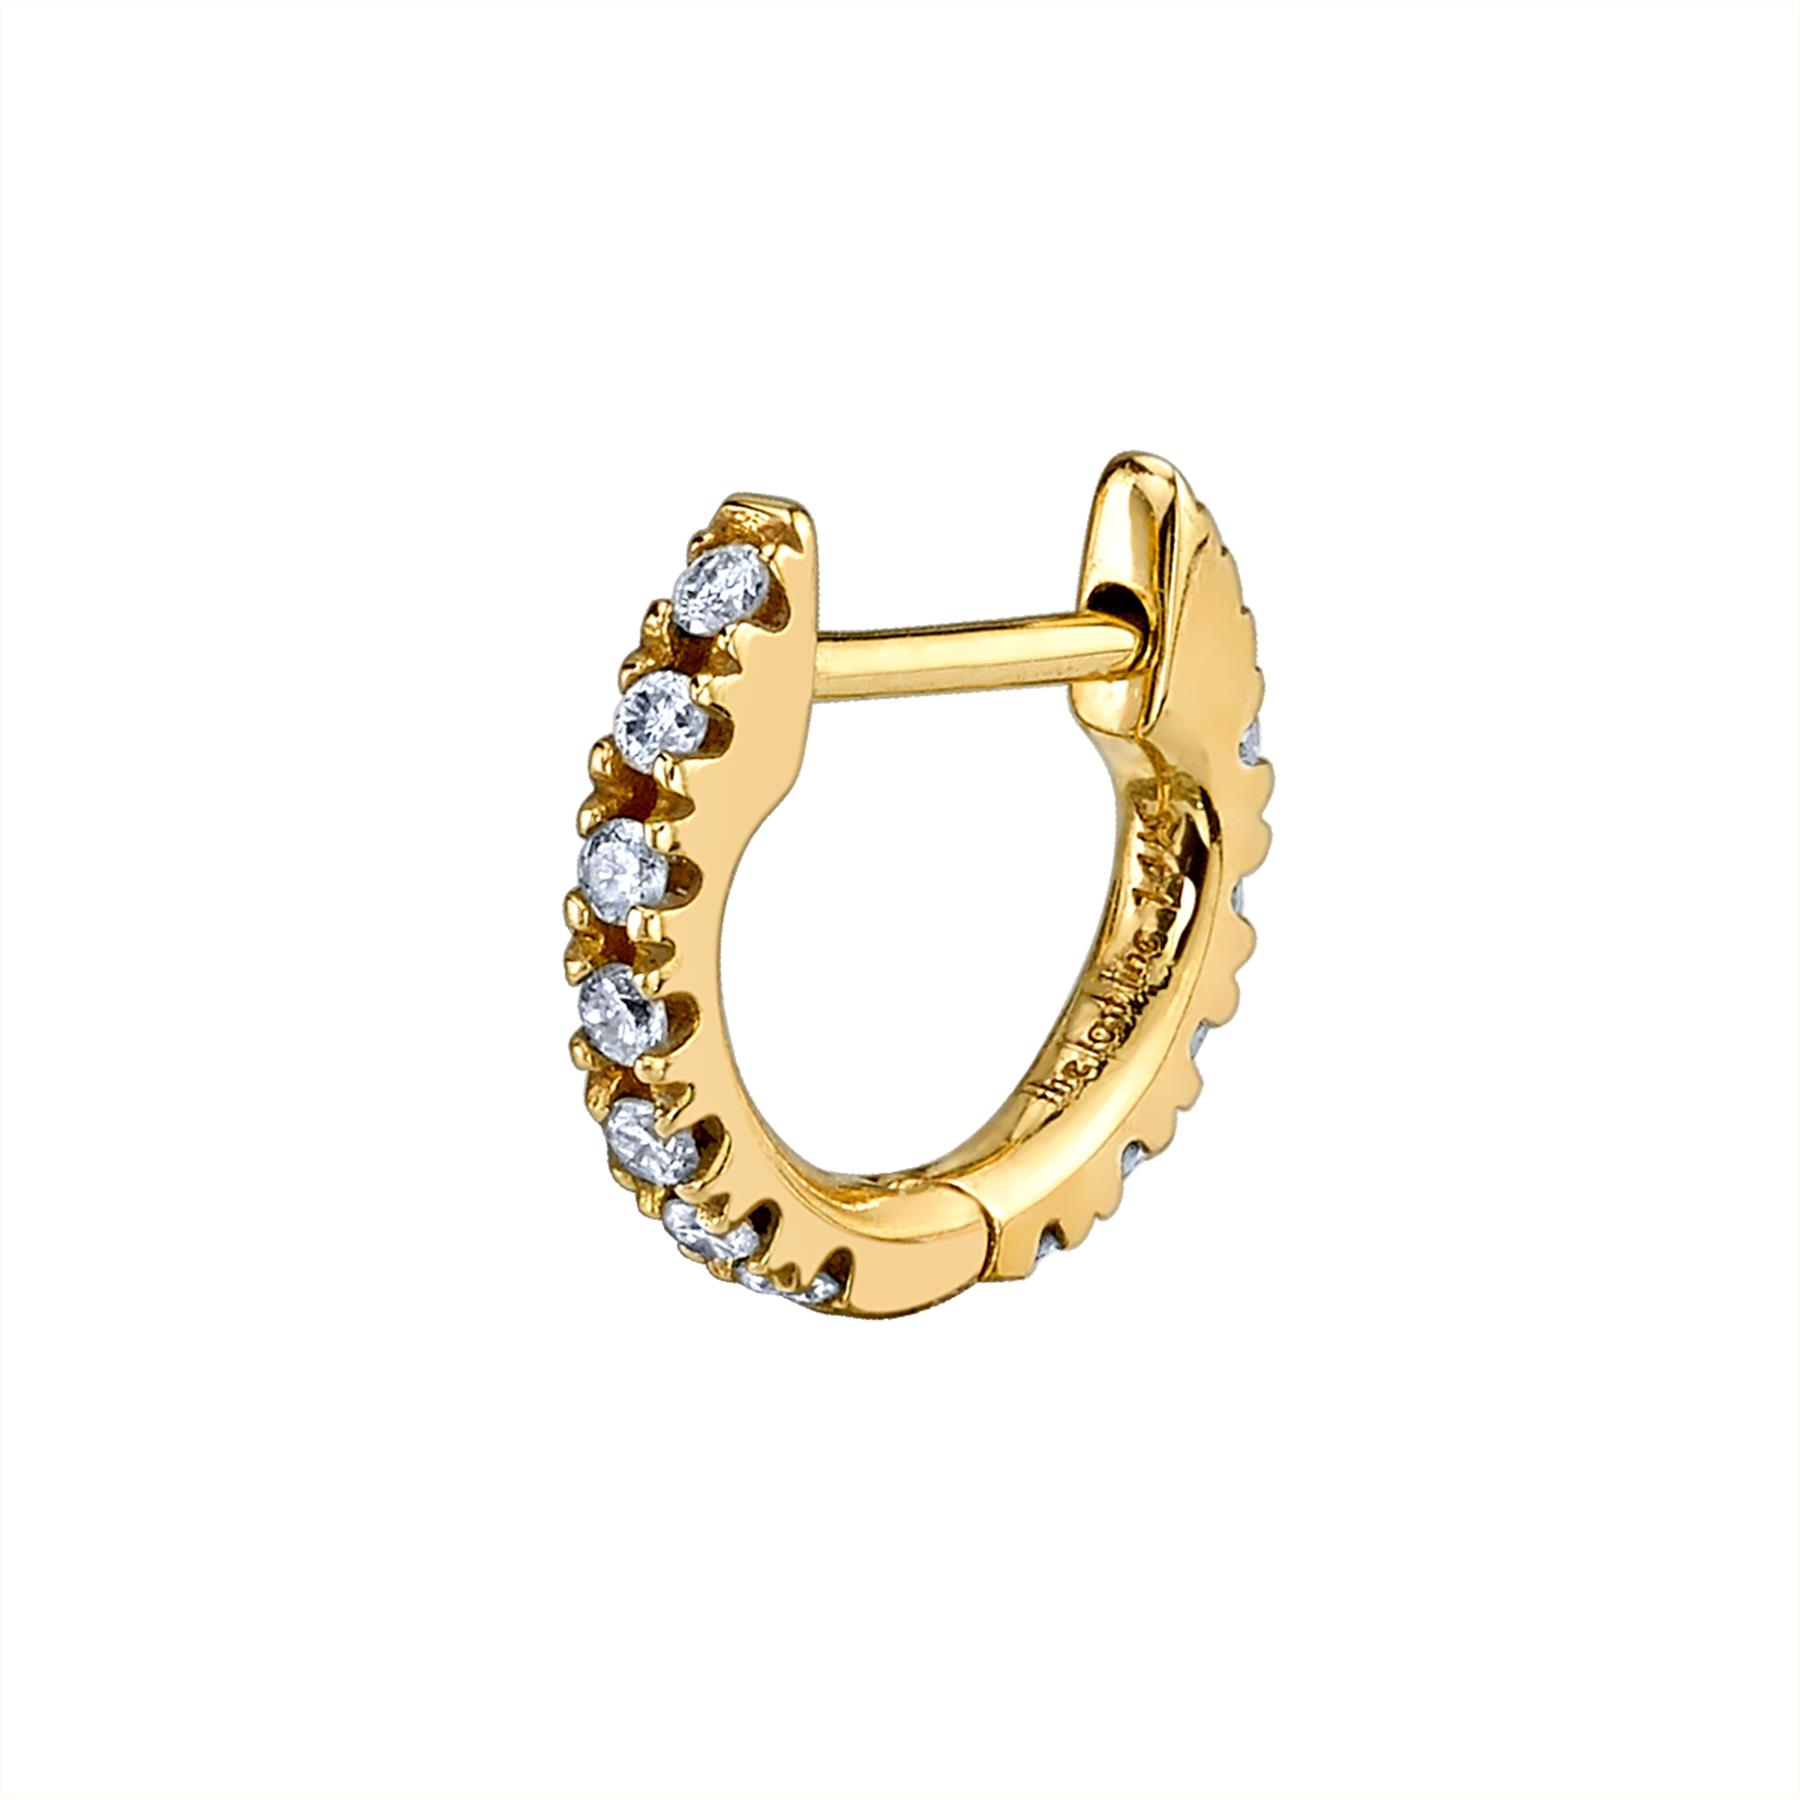 SMALL DIAMOND HUGGIE EARRING